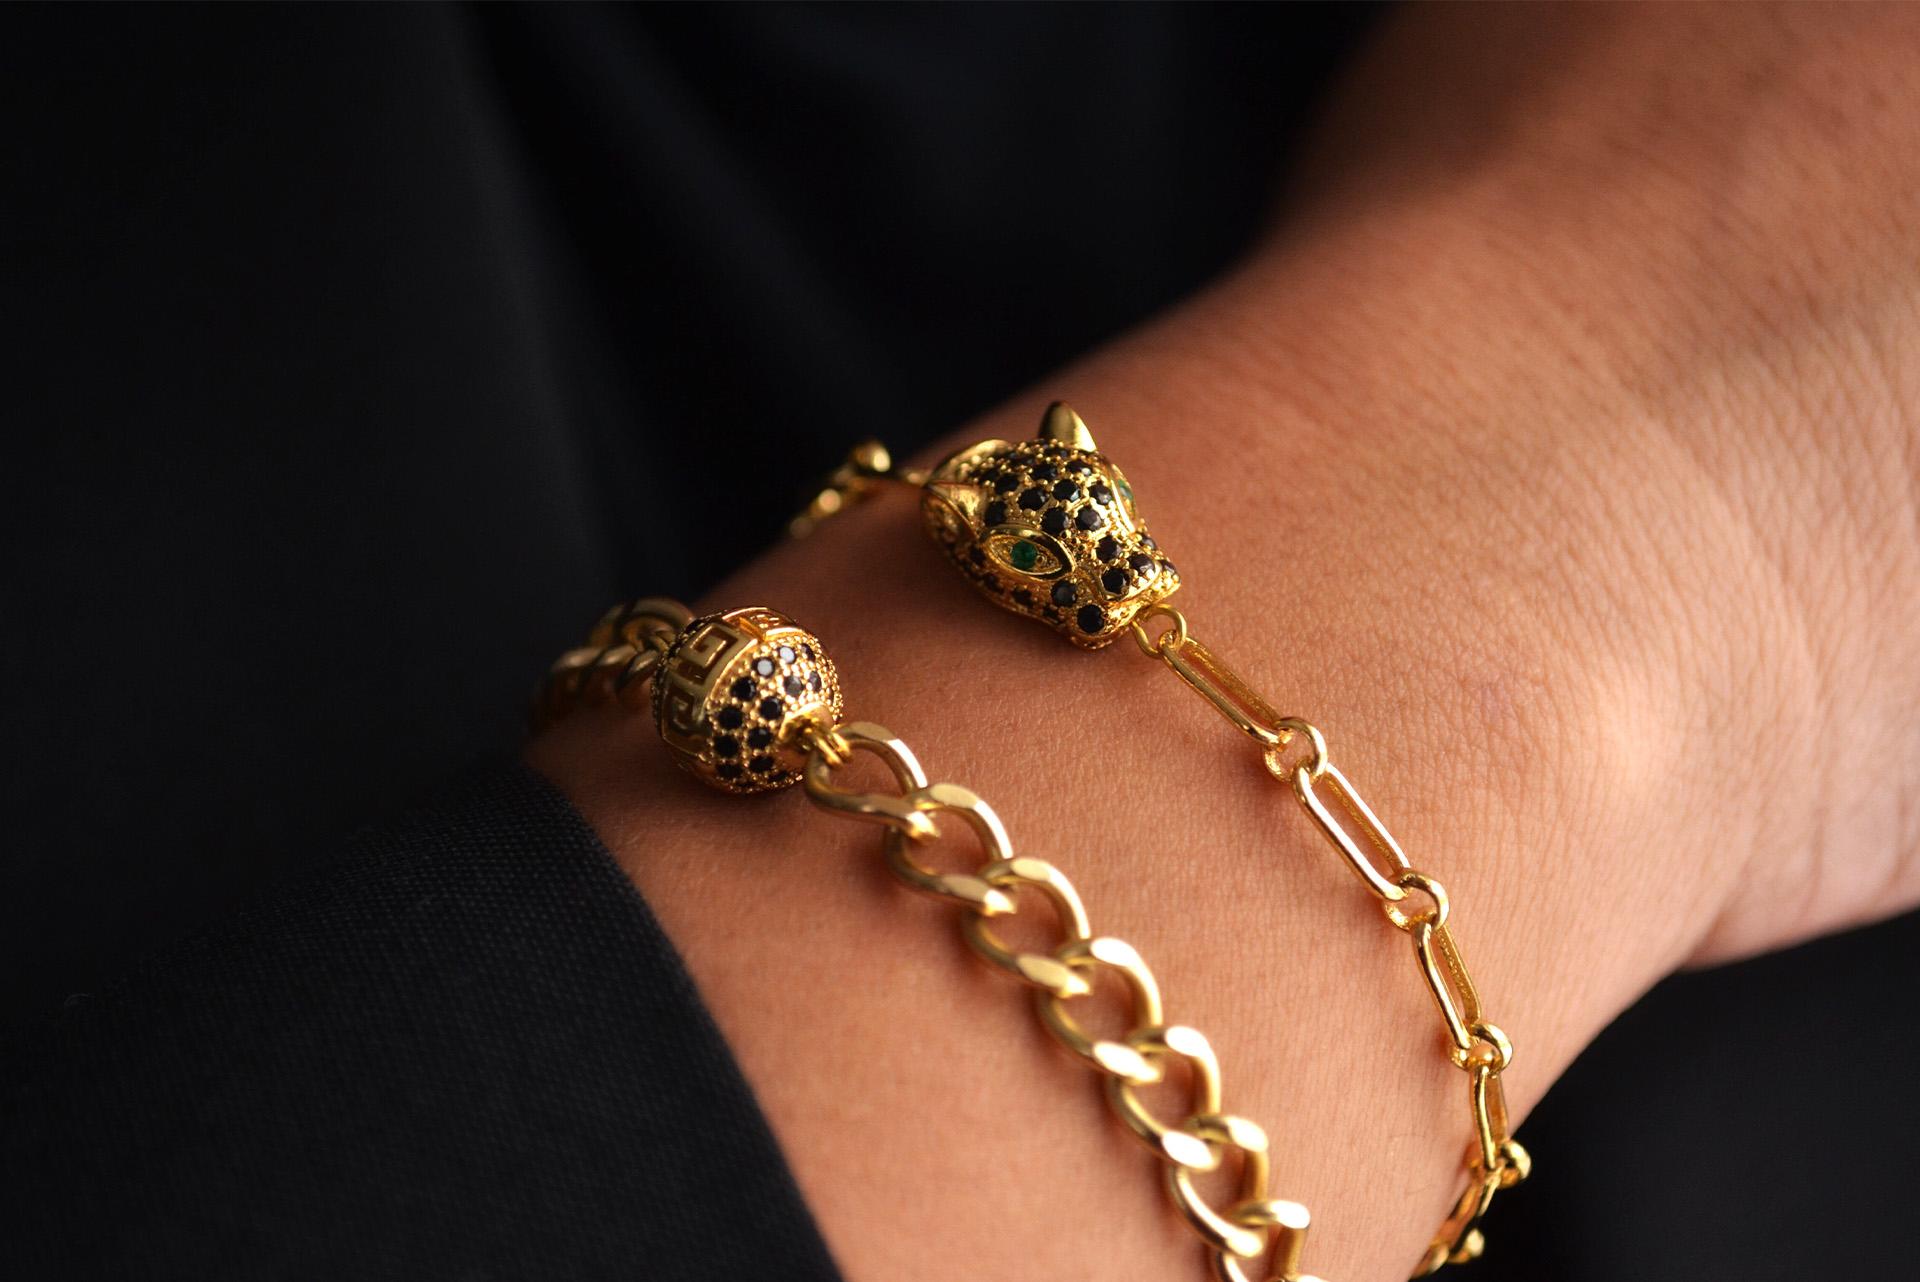 Close up image of two bracelets